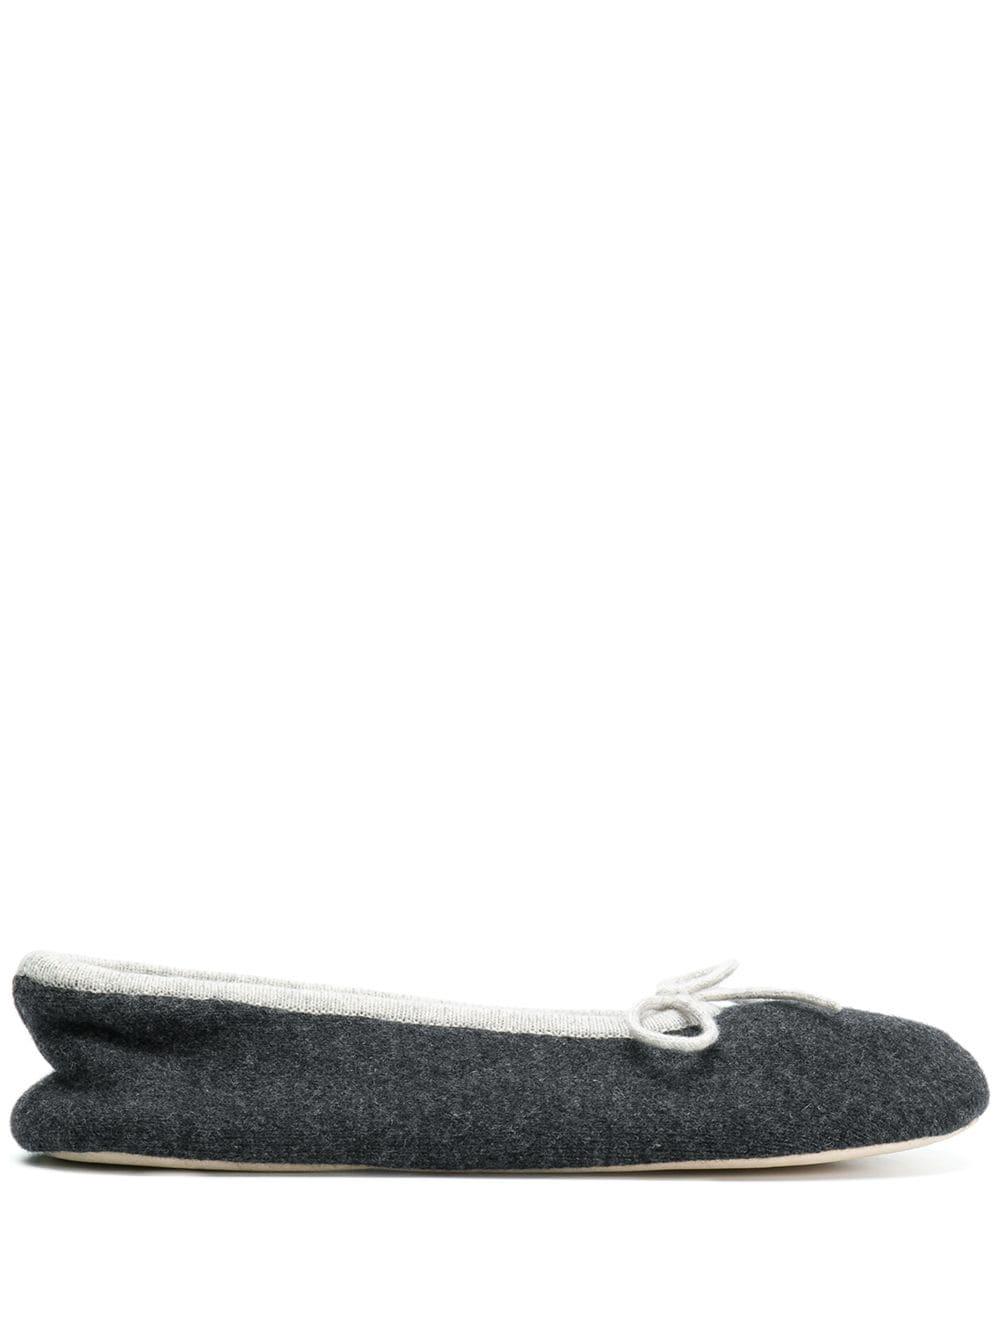 N.Peal Slipper mit Schleife - Grau